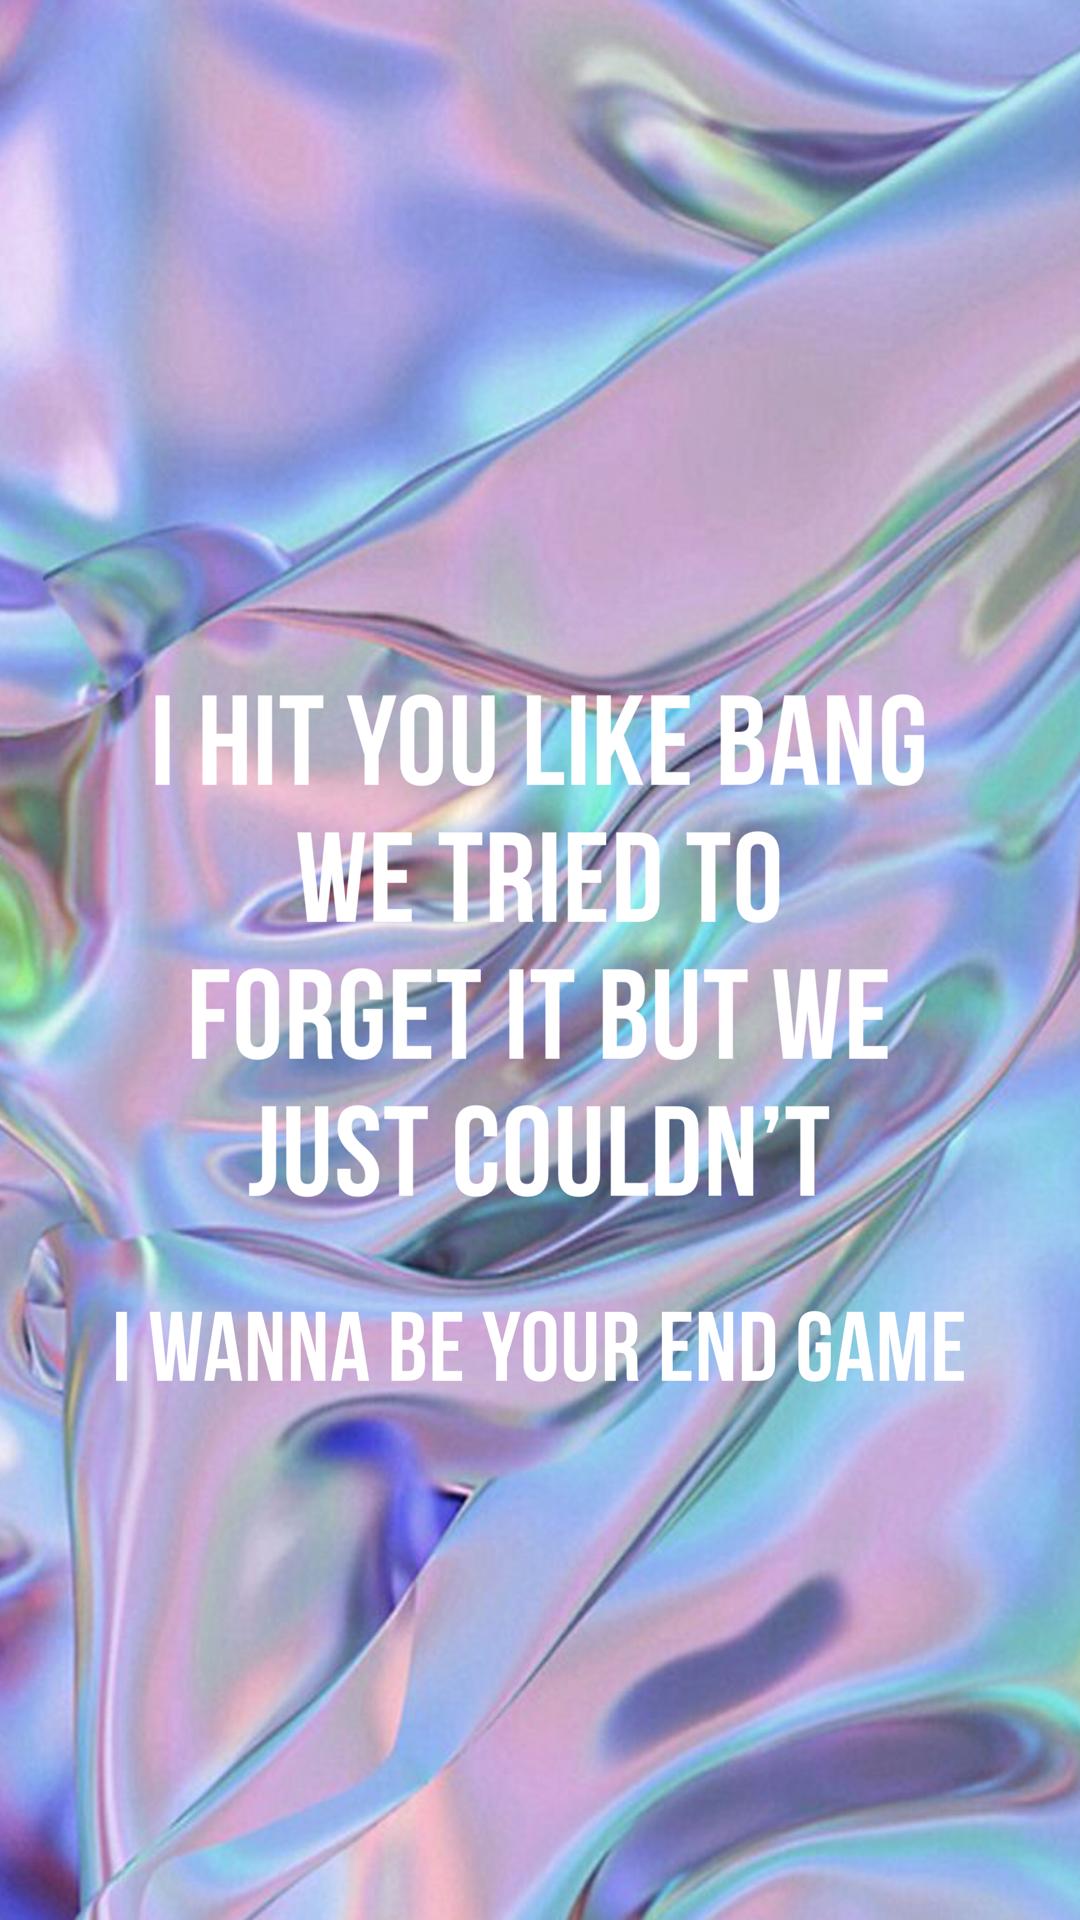 Endgame taylorswift lyrics reputation edsheeran future quotes endgame taylorswift lyrics reputation edsheeran future stopboris Image collections